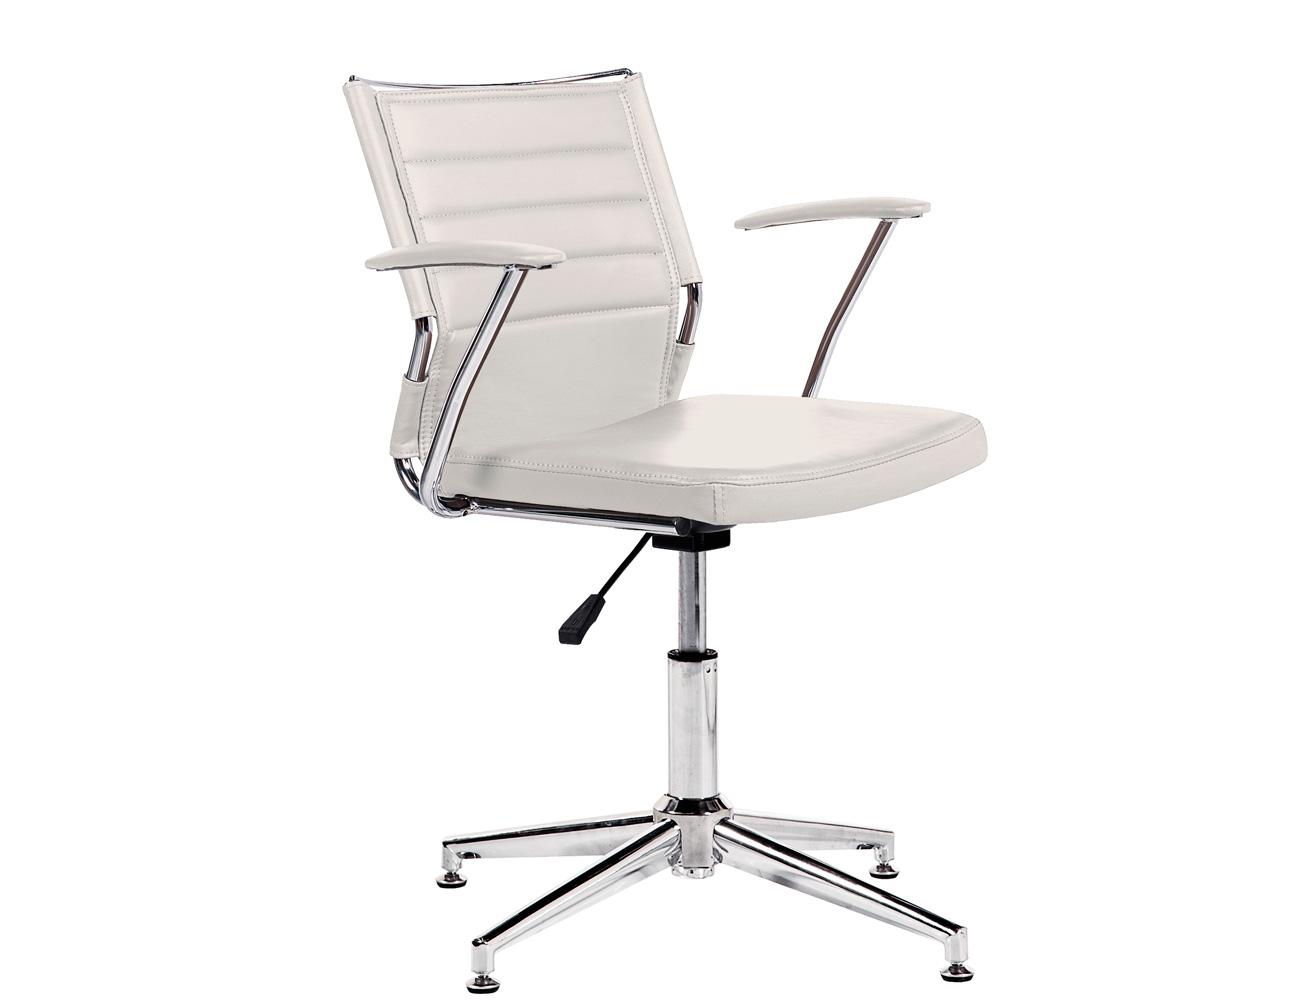 Silla oficina despacho regulable altura apoya brazos polipiel blanco